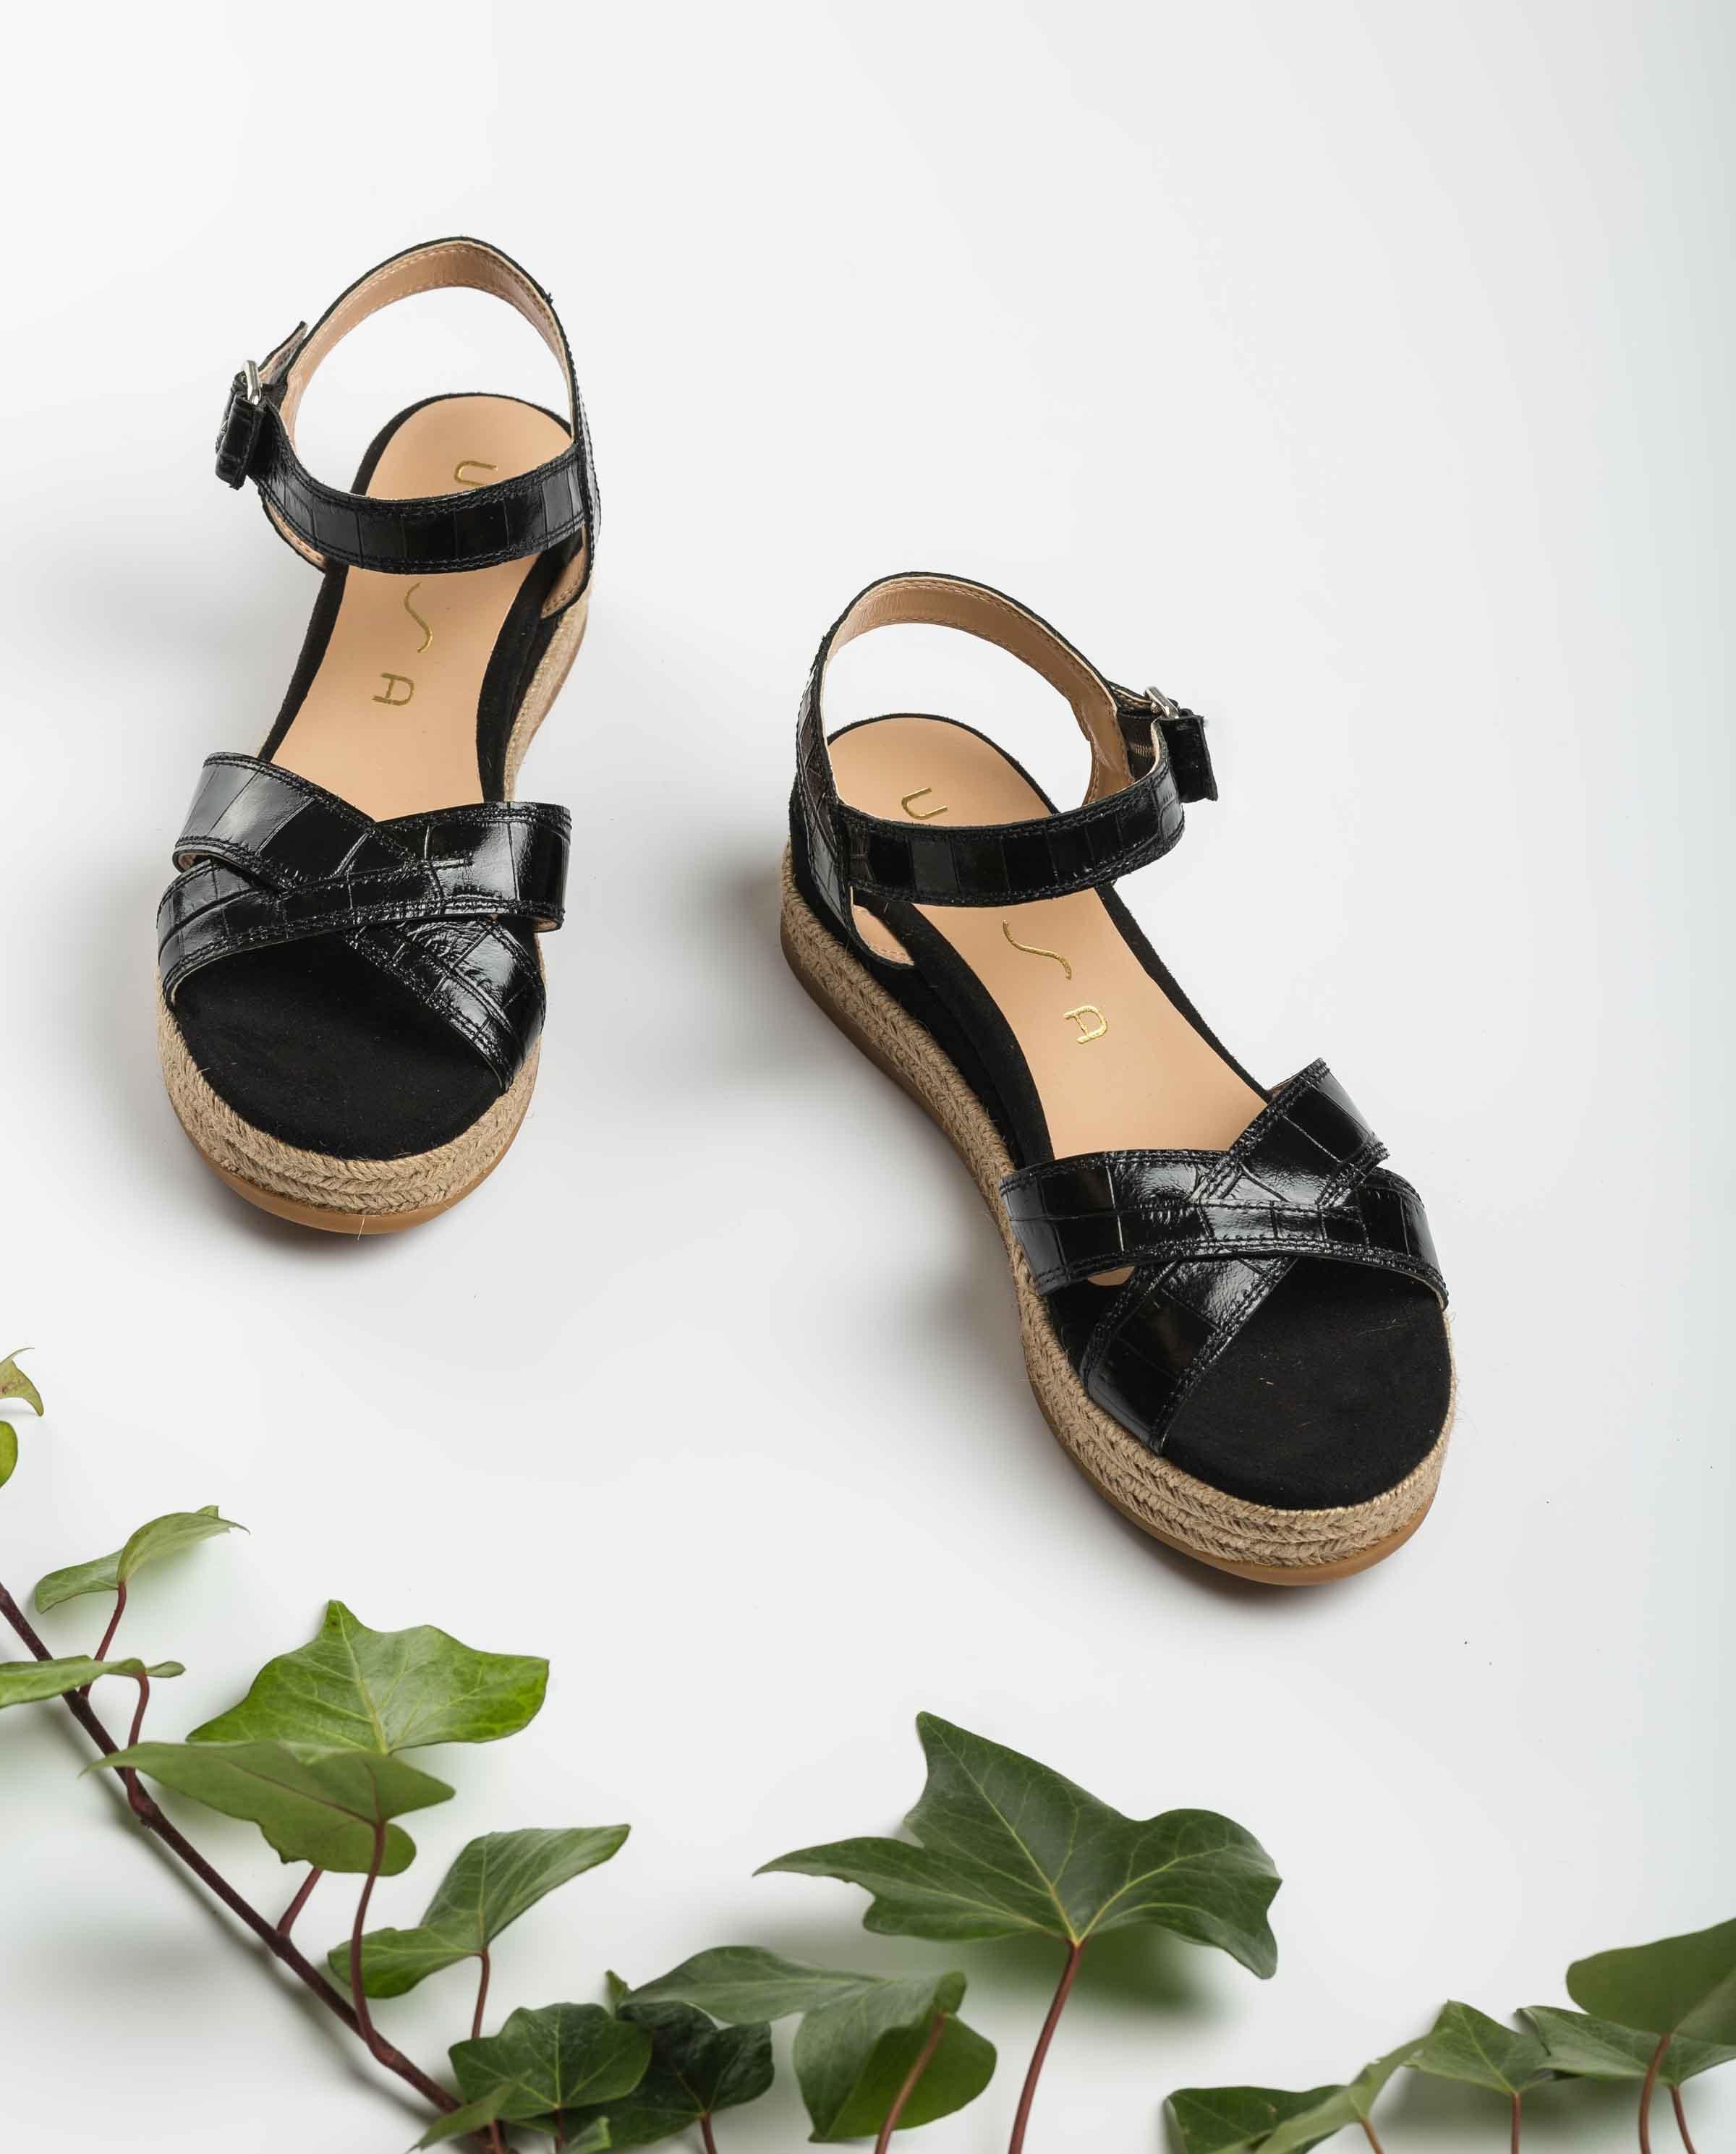 UNISA Leder-Wedges mit Kroko-Optik GRANADA_CRW_KS black 5